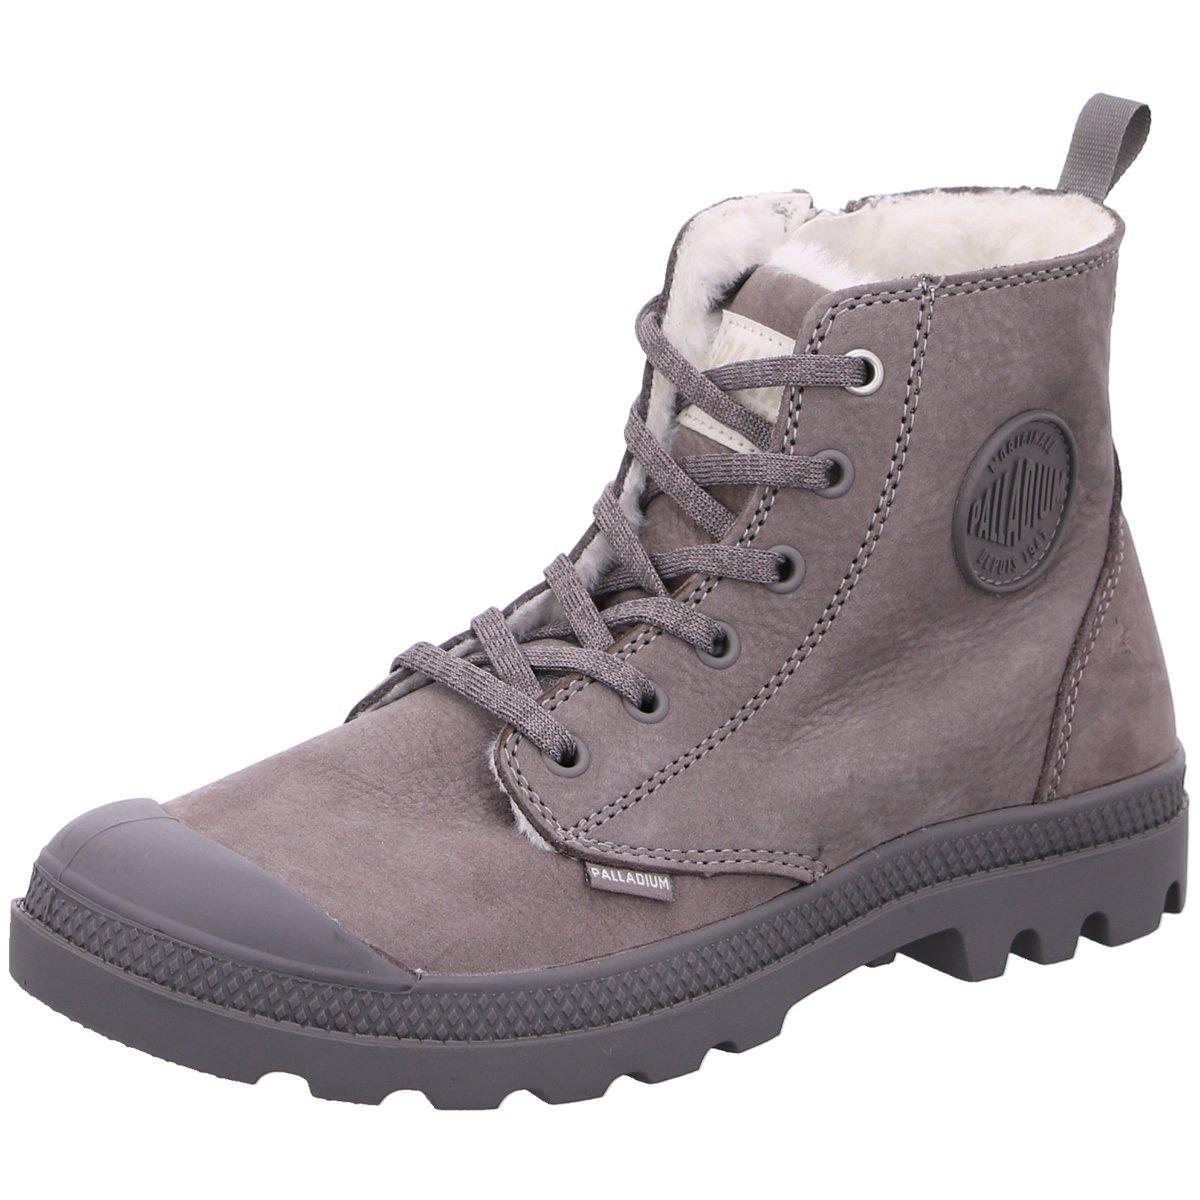 Tamaris Woms Boots Damen Stiefel grau 1 1 25315 20324 324